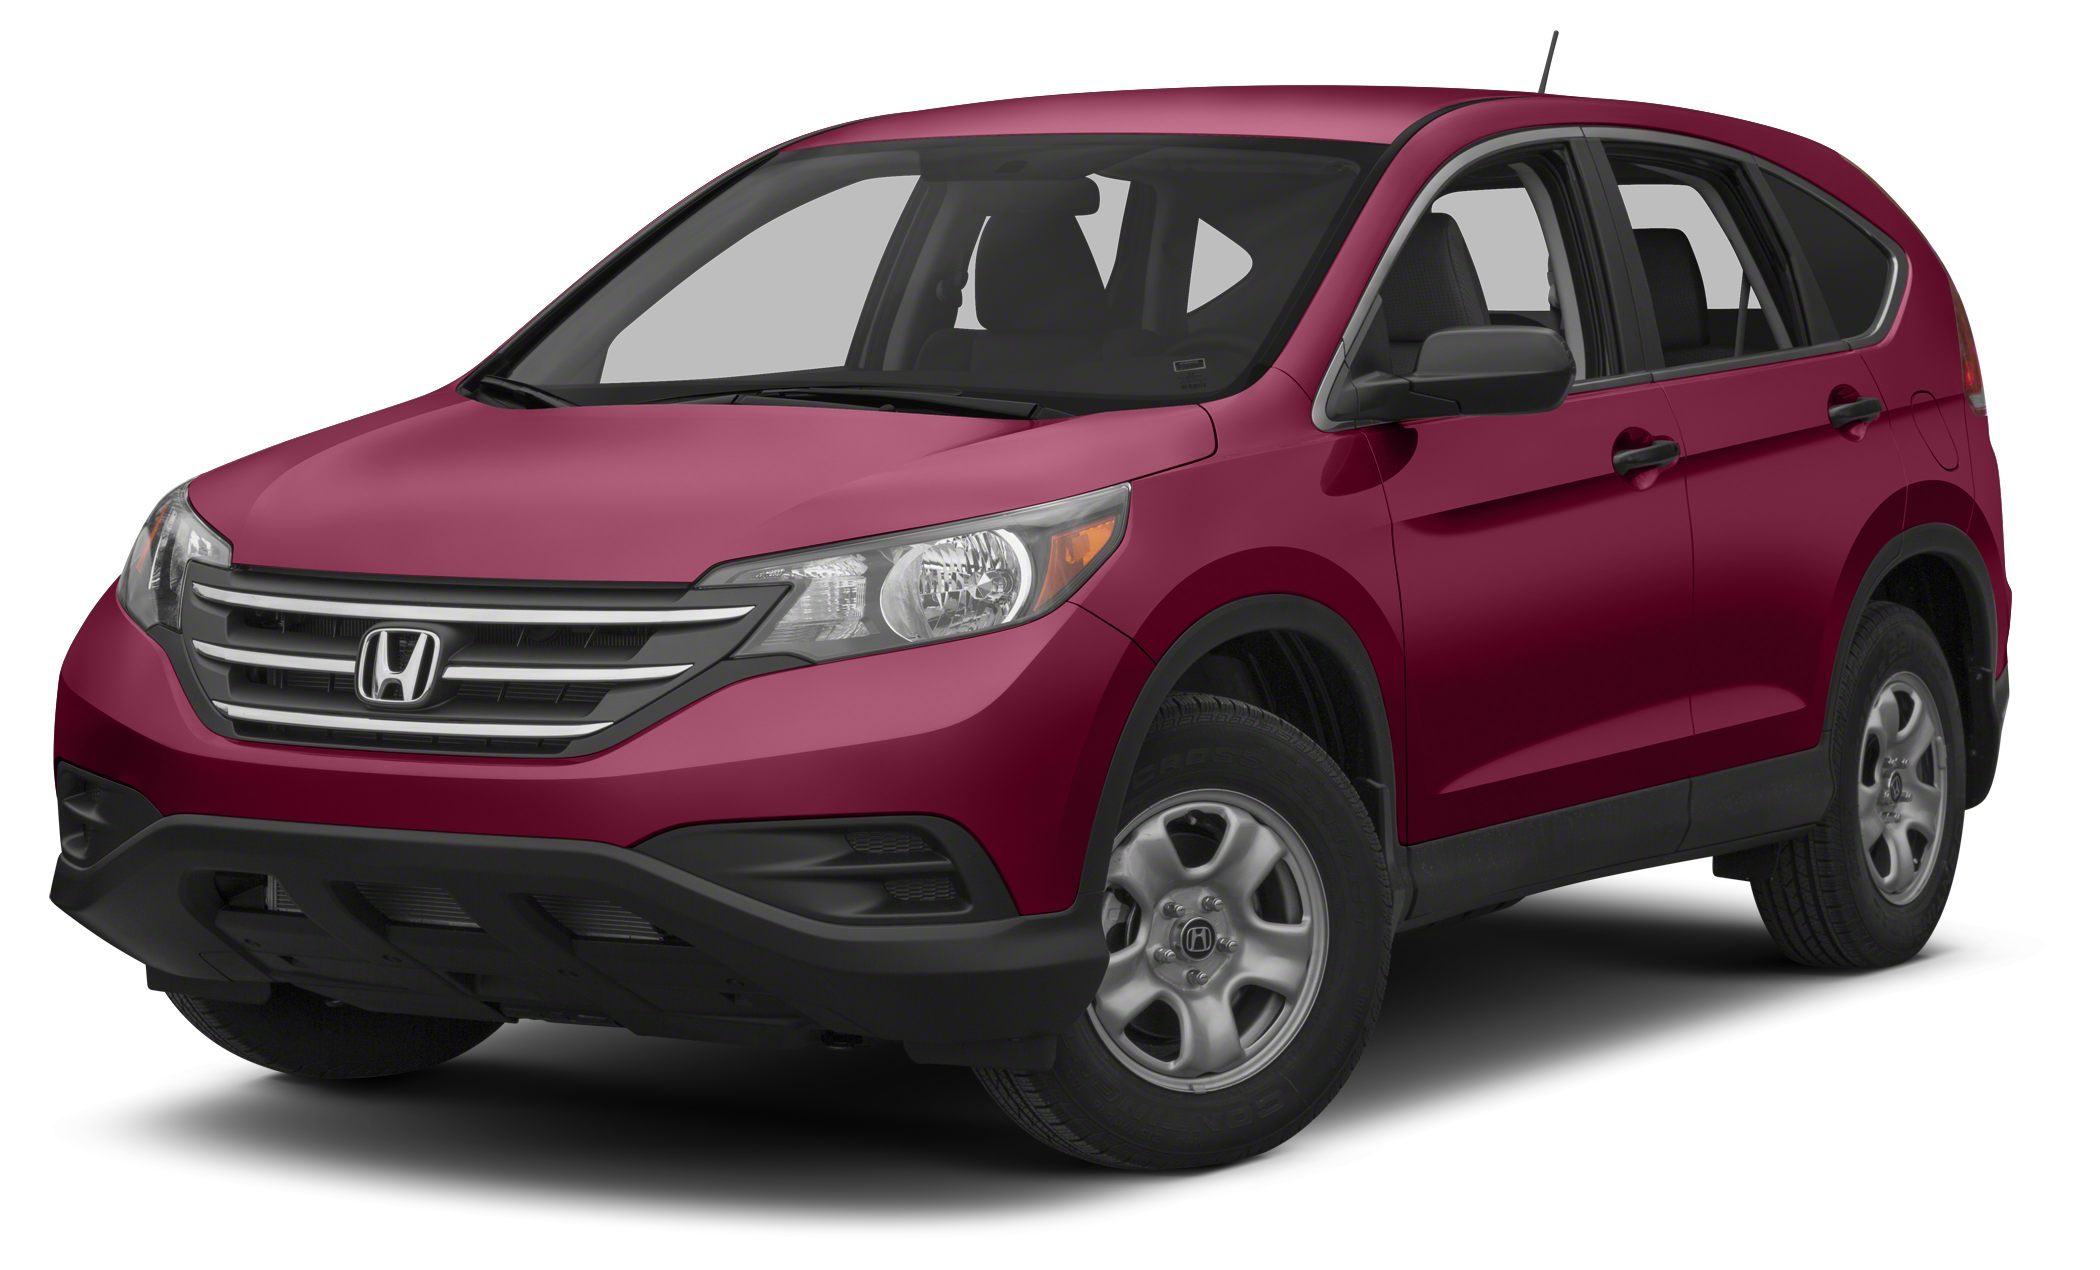 2013 Honda CR-V LX Miles 4983Color Red Stock H152080A VIN 5J6RM3H32DL019126